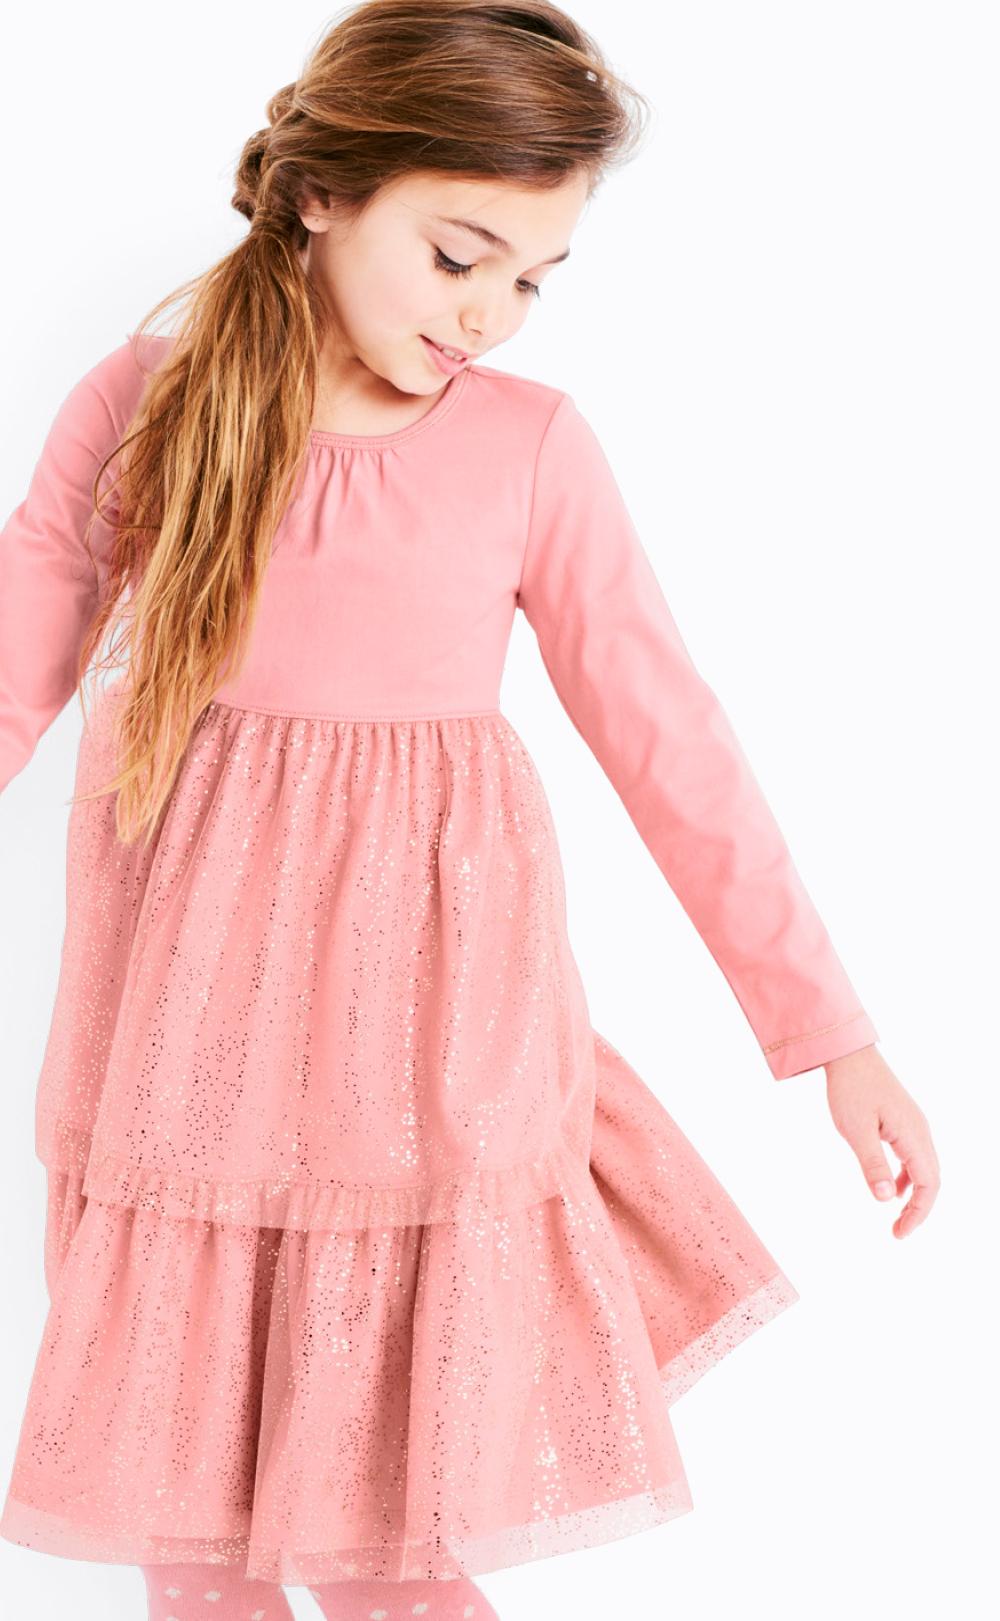 dresses of the season - twirly sparkle dress